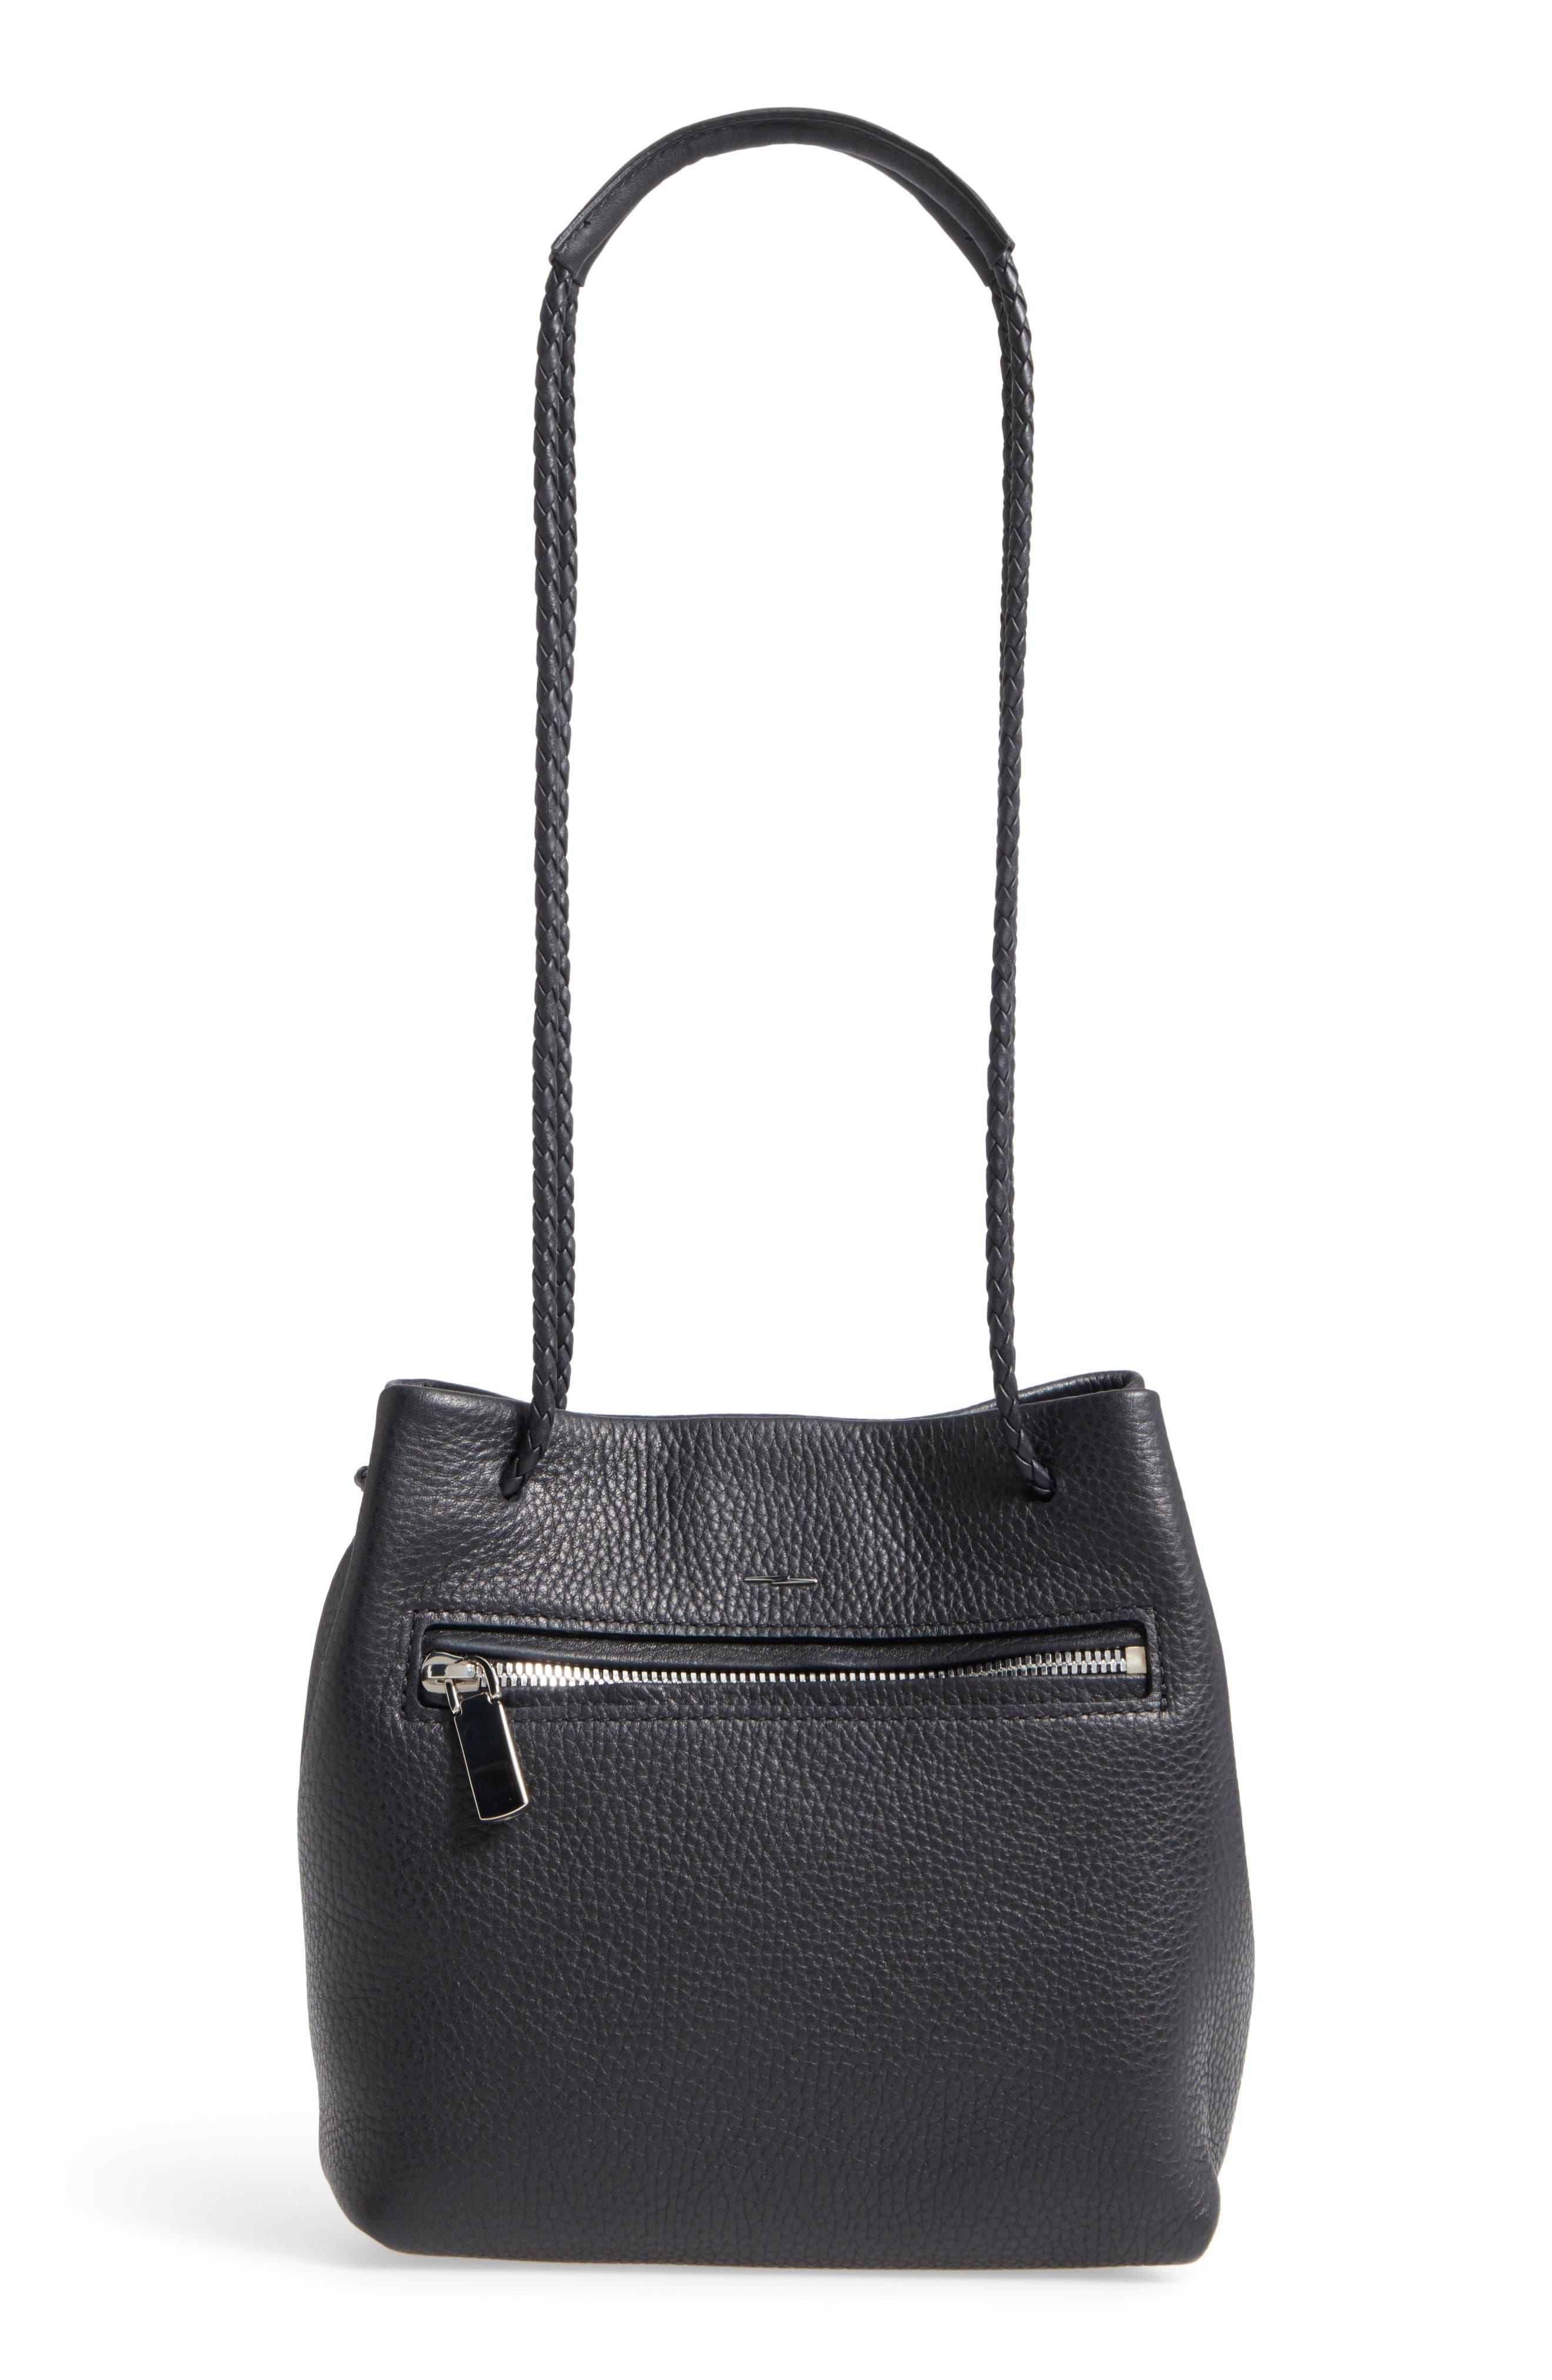 Alternate Image 1 Selected - Shinola Mini Pebbled Leather Drawstring Crossbody Bag